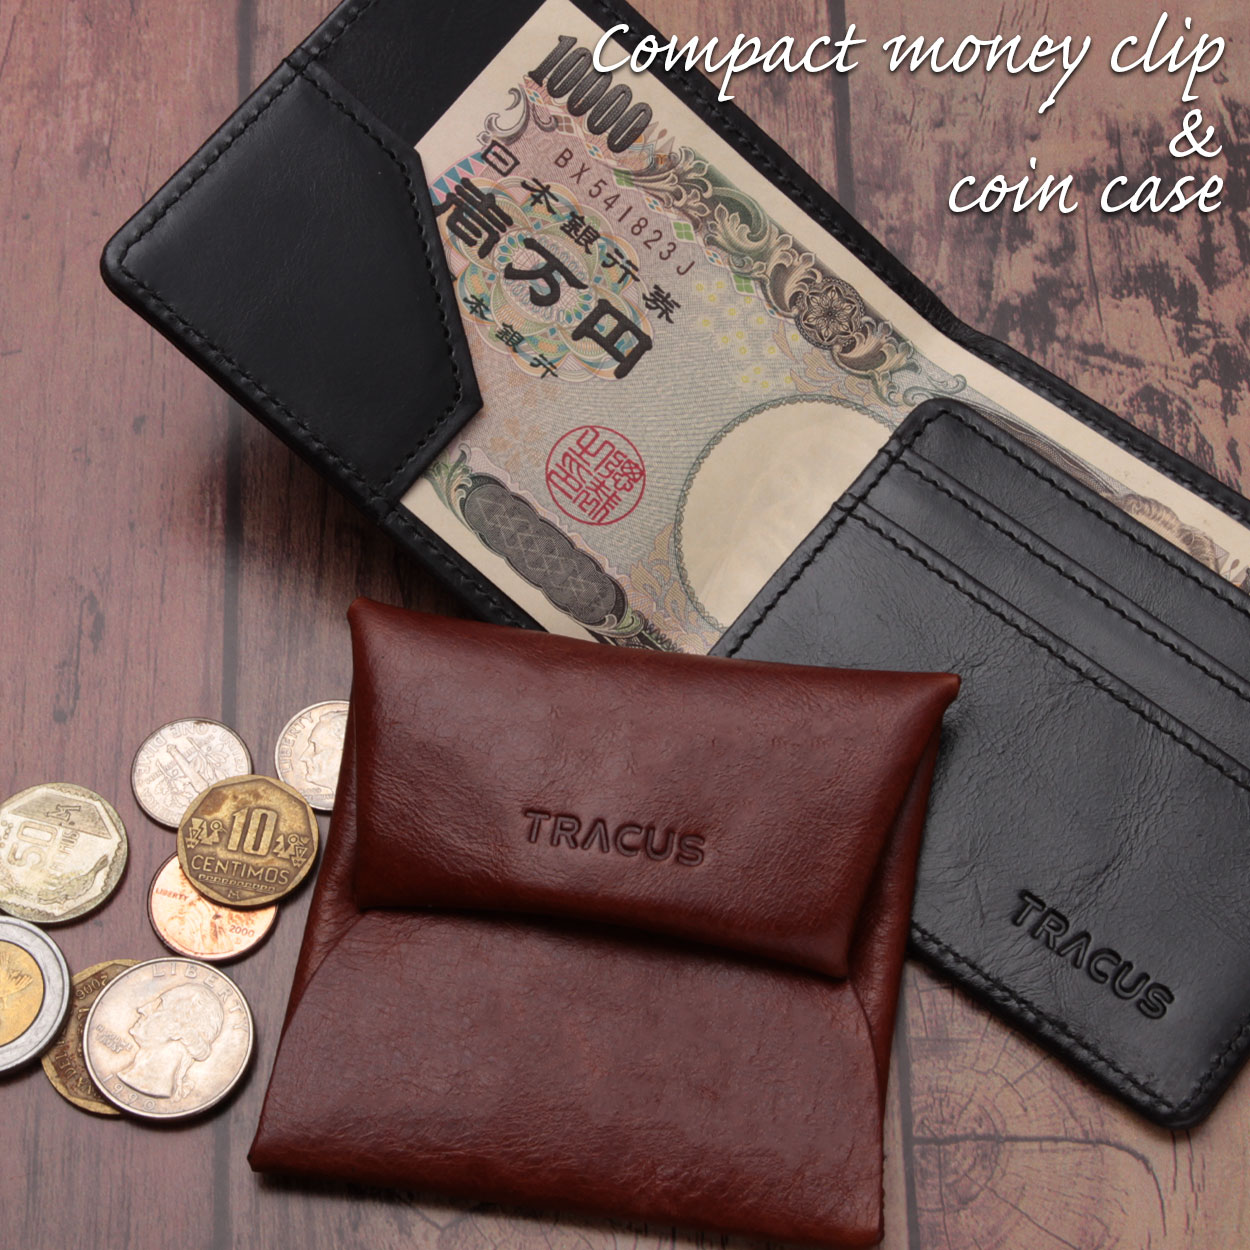 【TRACUS(トラッカス)】マネークリップ 二つ折り財布 小銭入れ無し